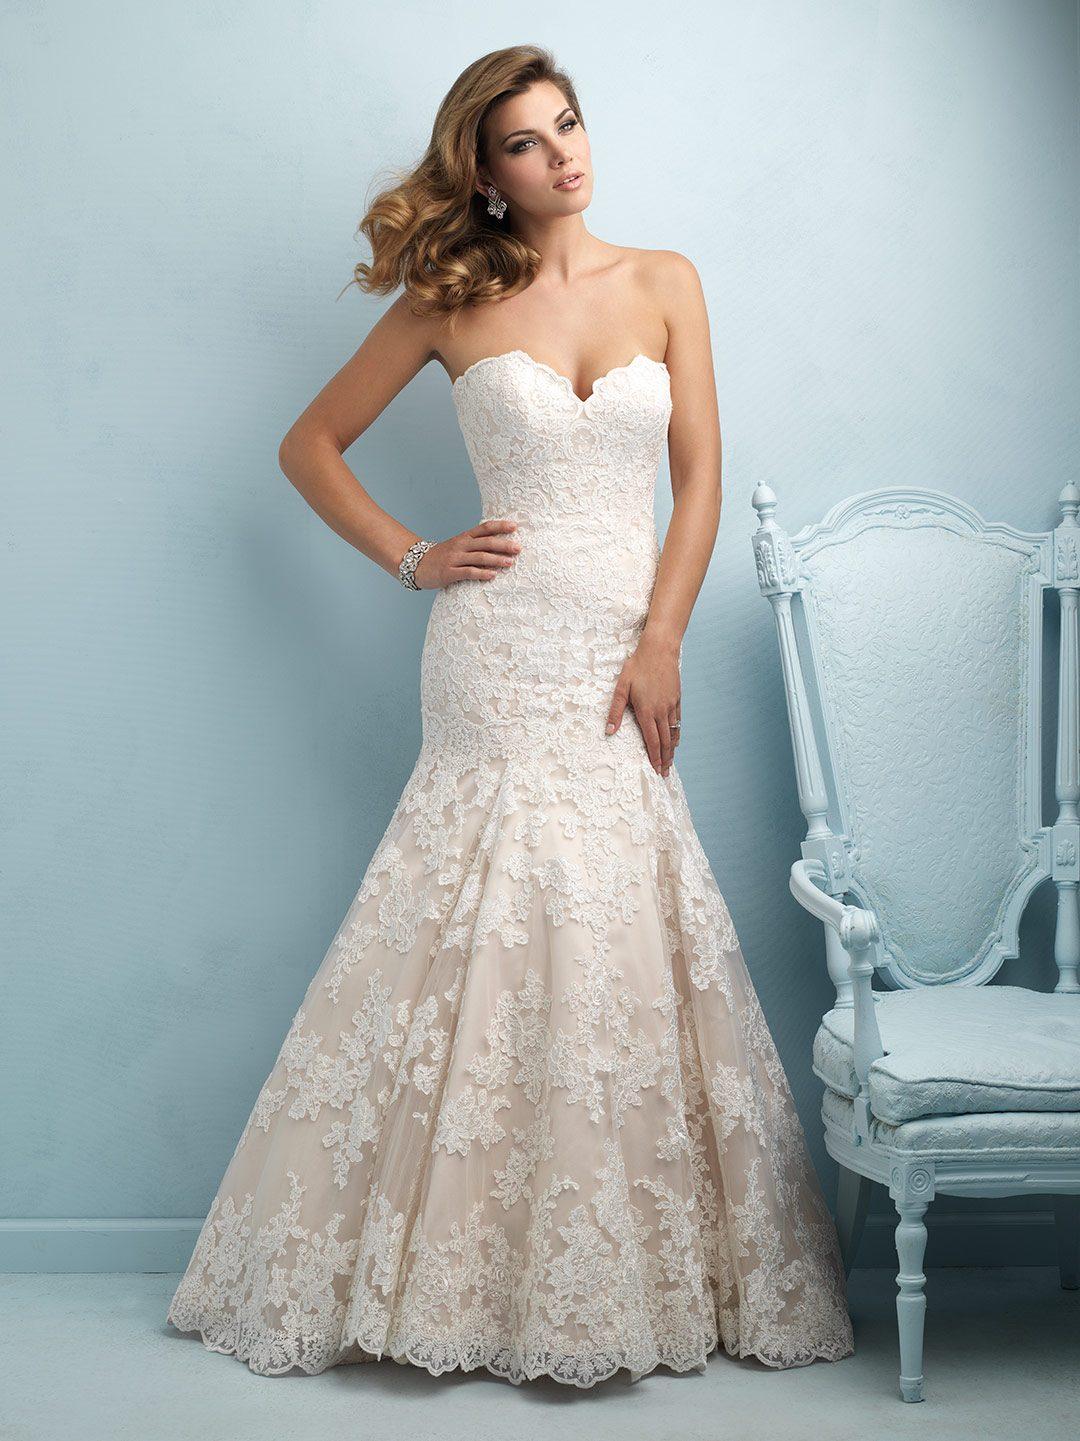 Allure Wedding Dresses.Allure Bridal 9215